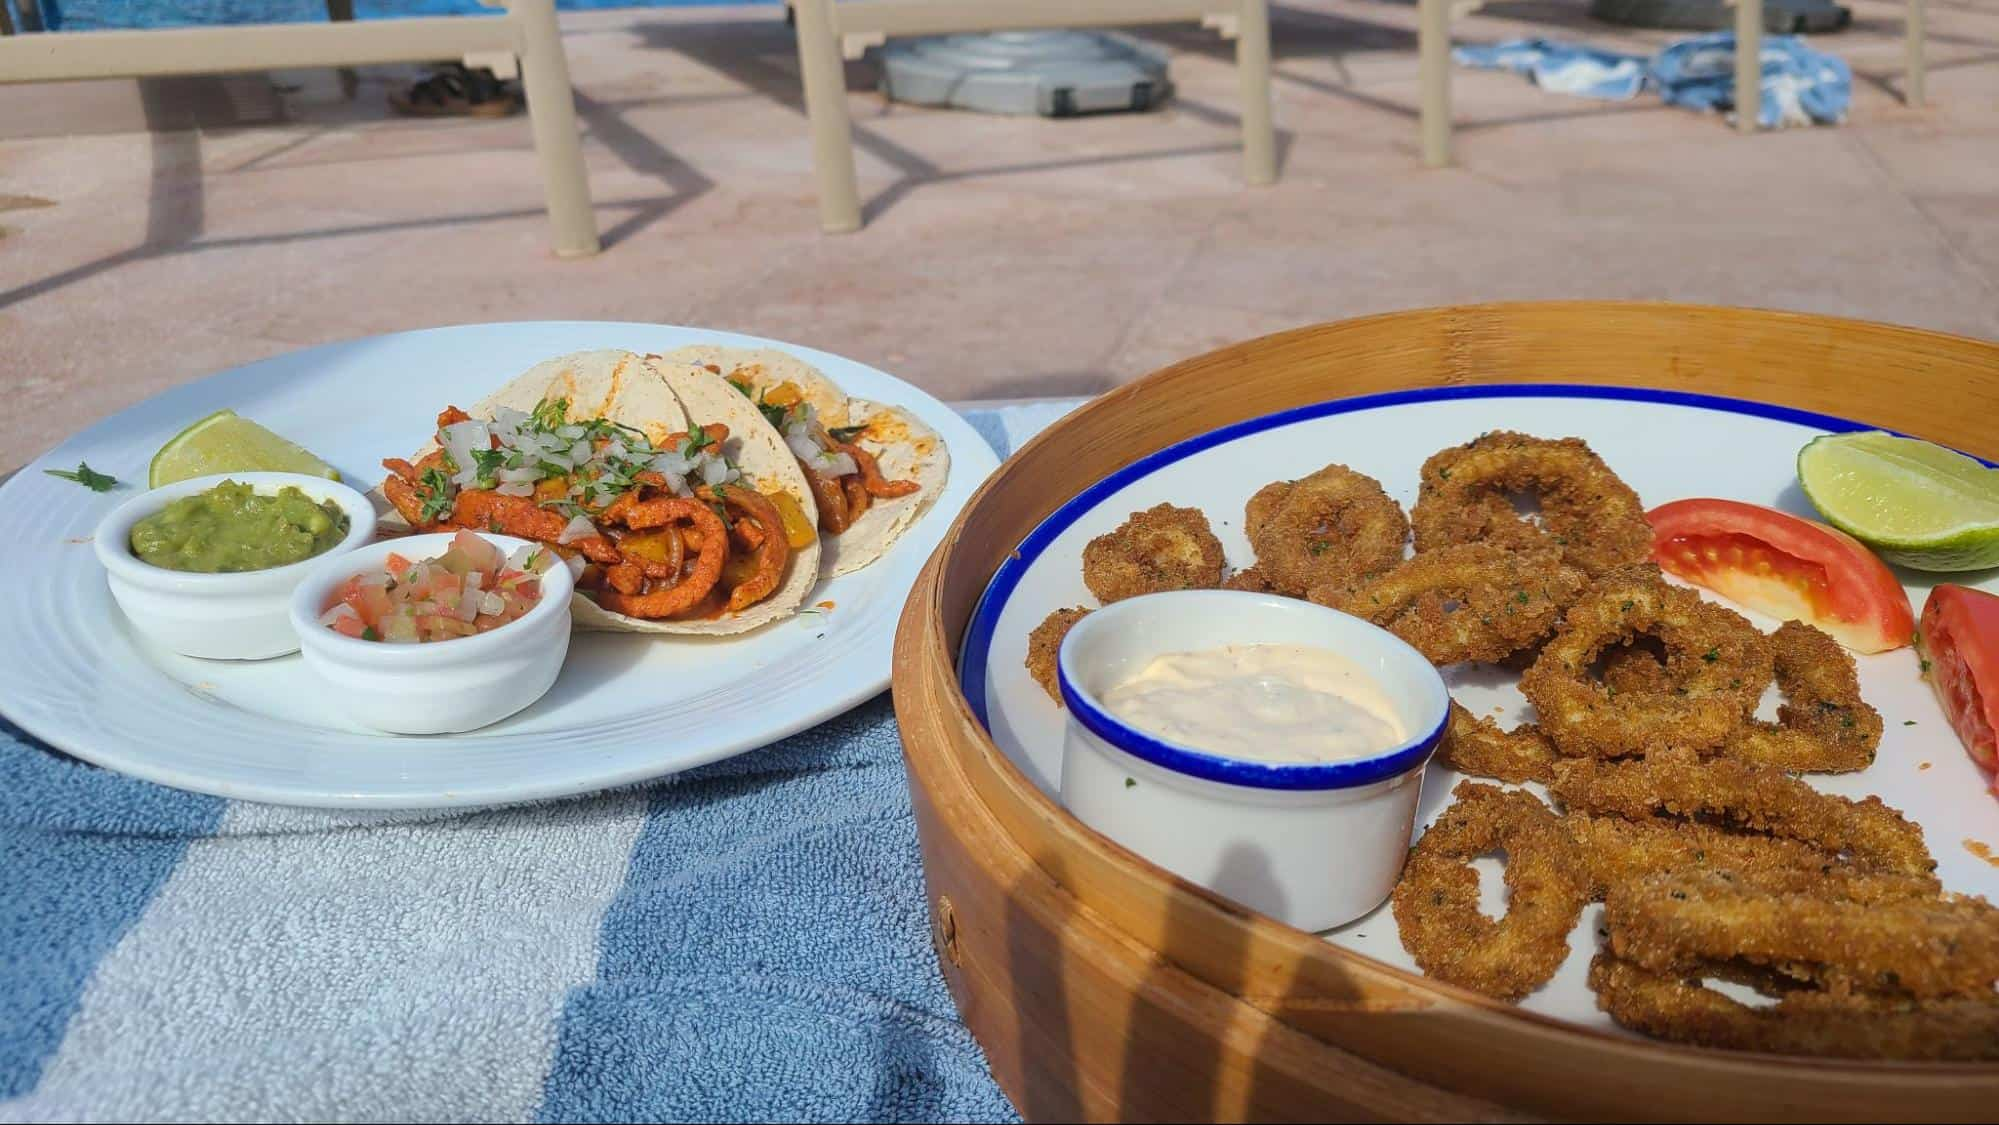 Poolside order of food at Marriott Cancun Resort